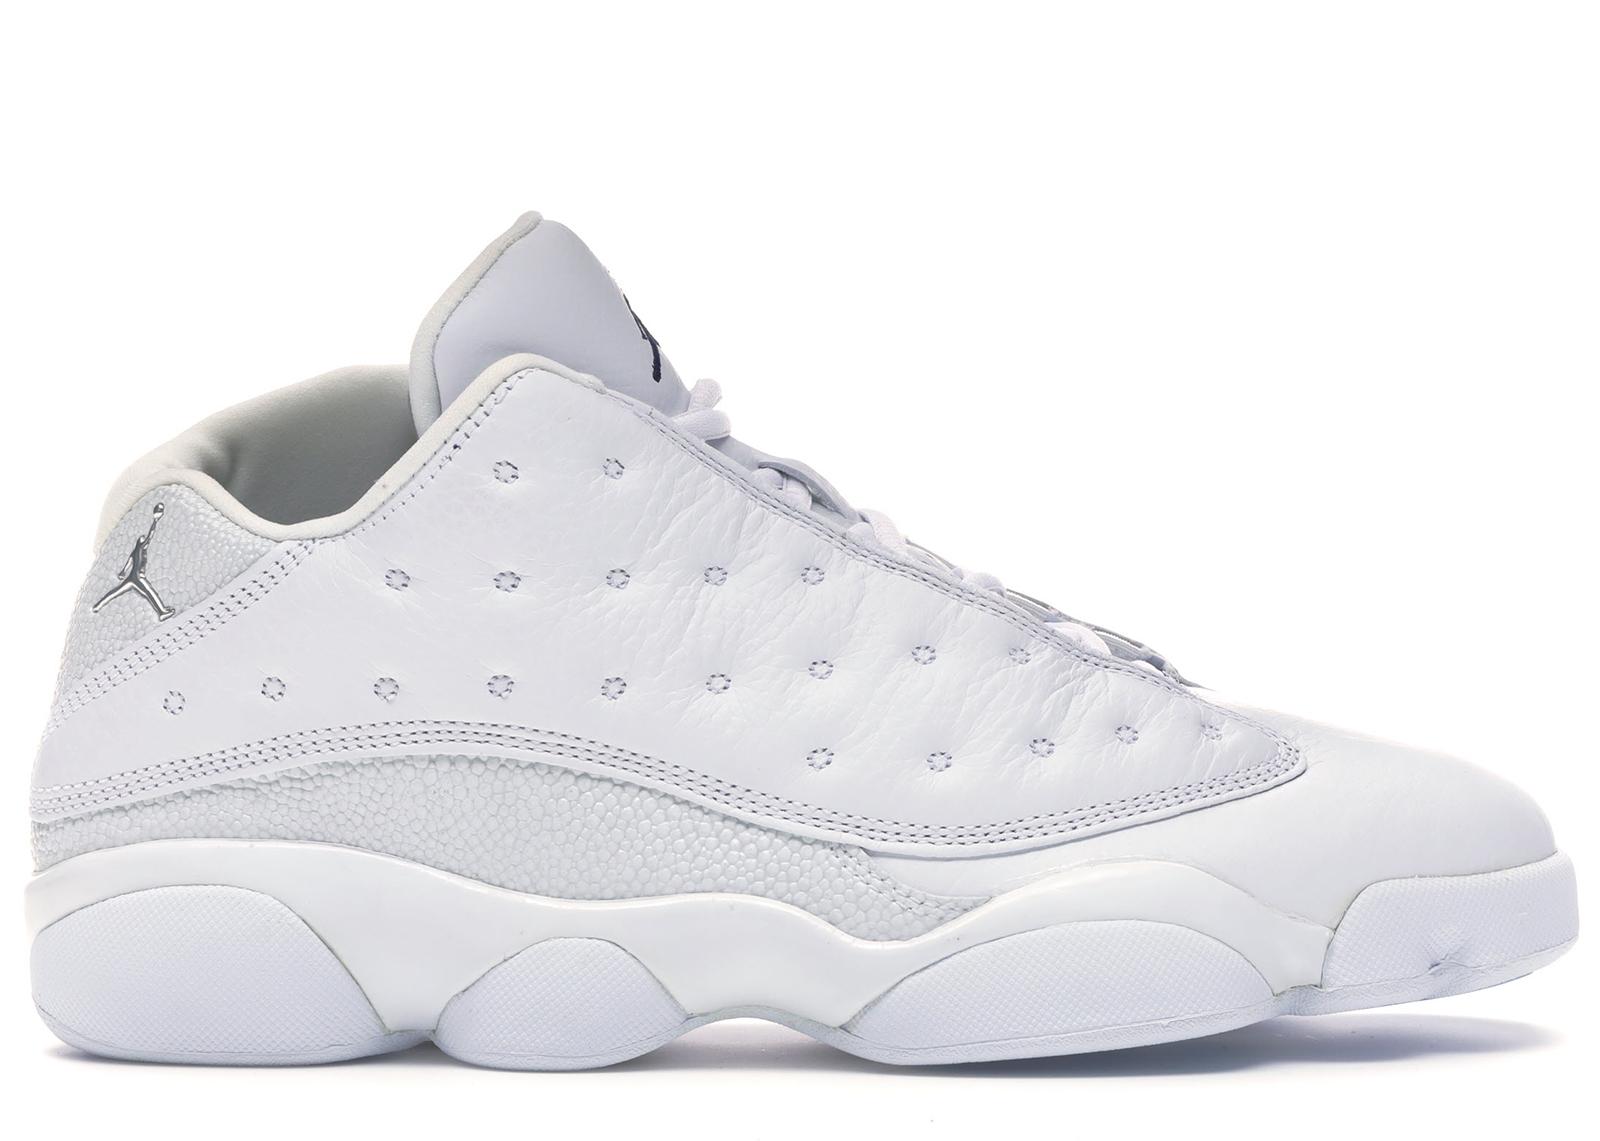 Jordan 13 Retro Low All White - 310810-103